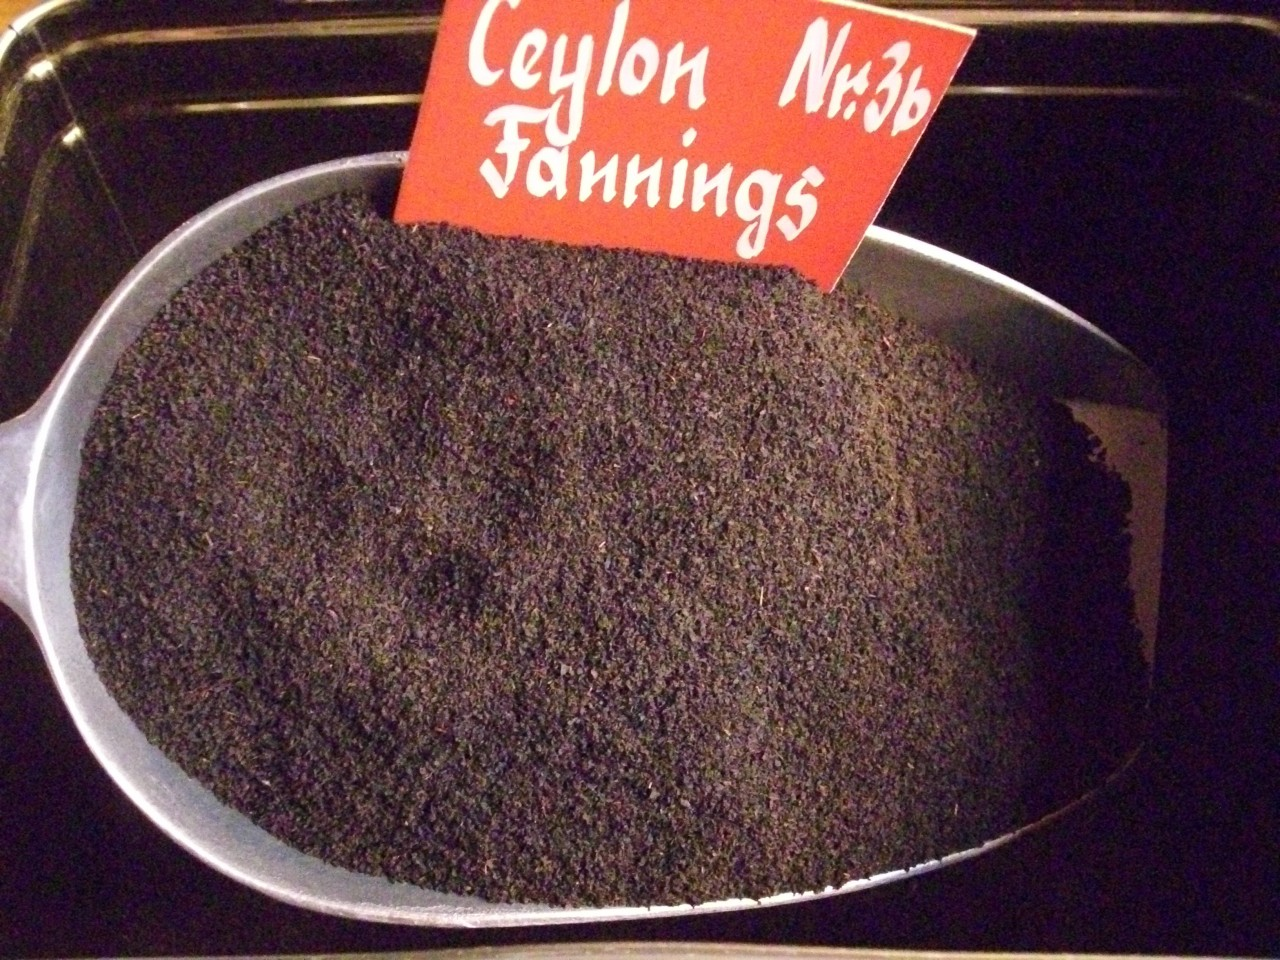 Ceylon Fannings 3b